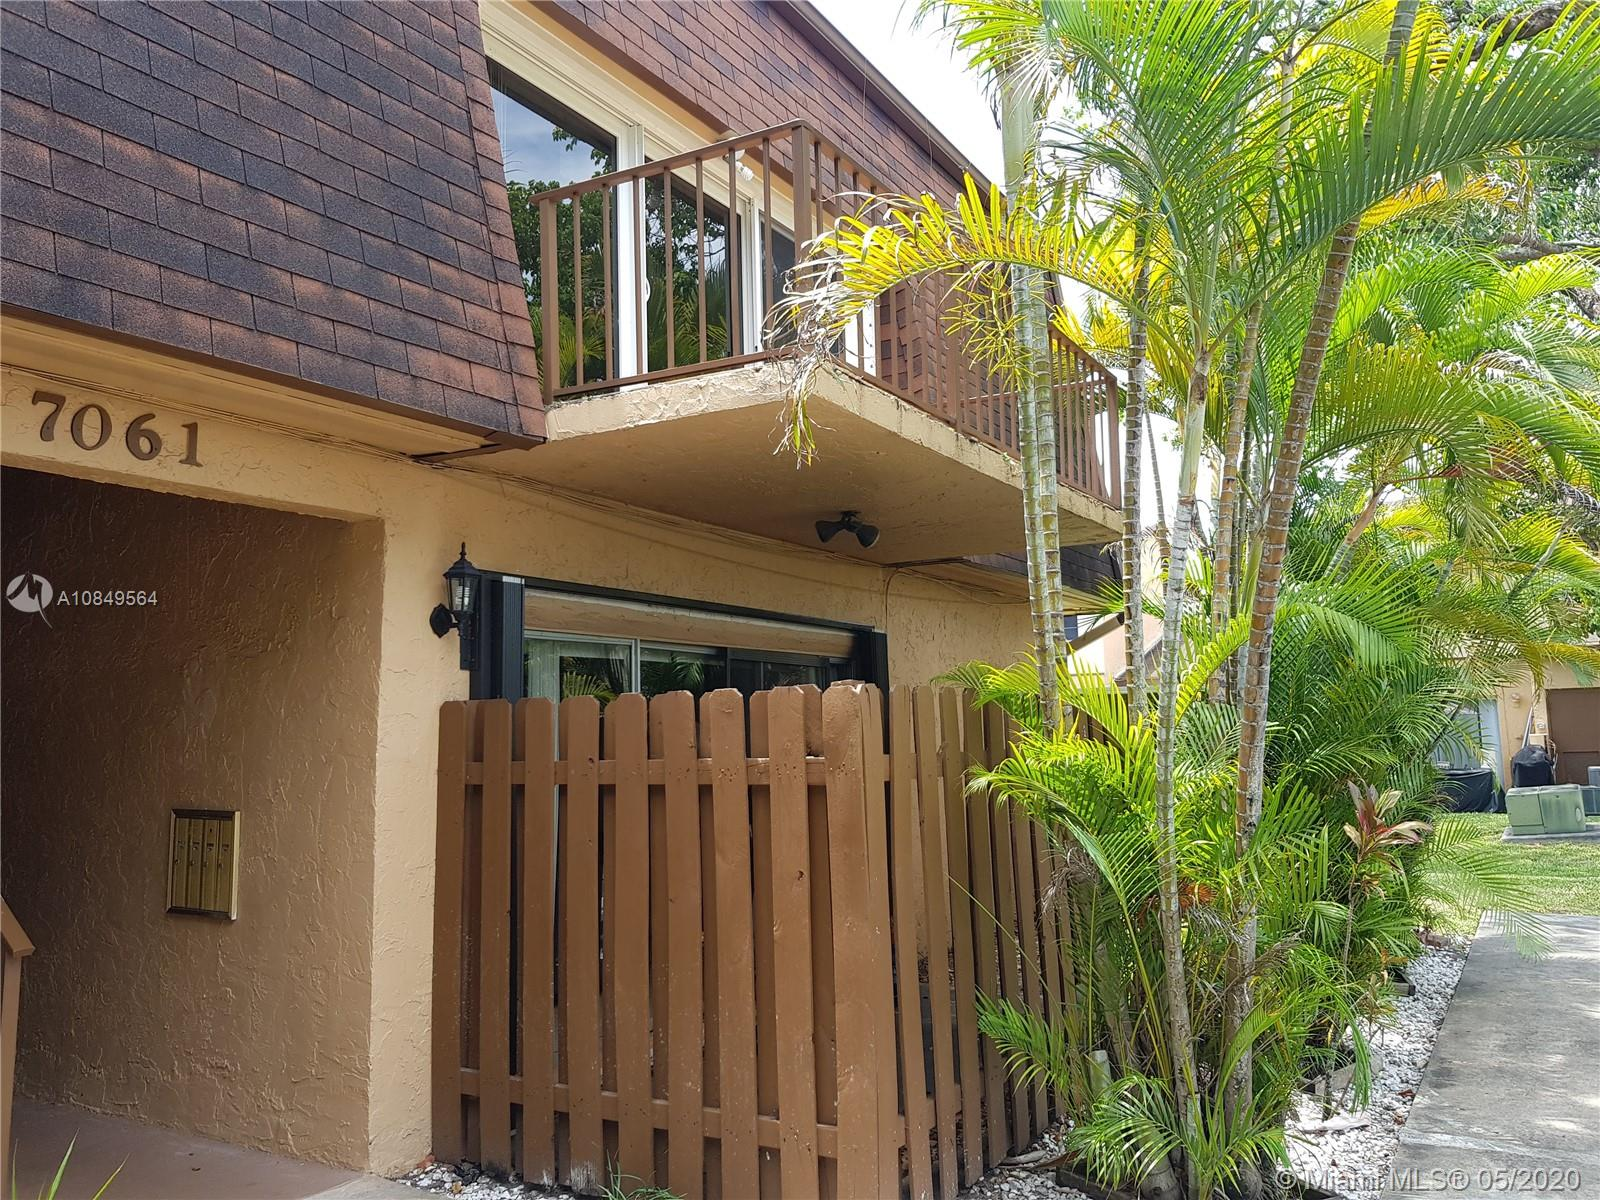 7061 W Sunrise Blvd # B2, Plantation, Florida 33313, 2 Bedrooms Bedrooms, ,1 BathroomBathrooms,Residential,For Sale,7061 W Sunrise Blvd # B2,A10849564